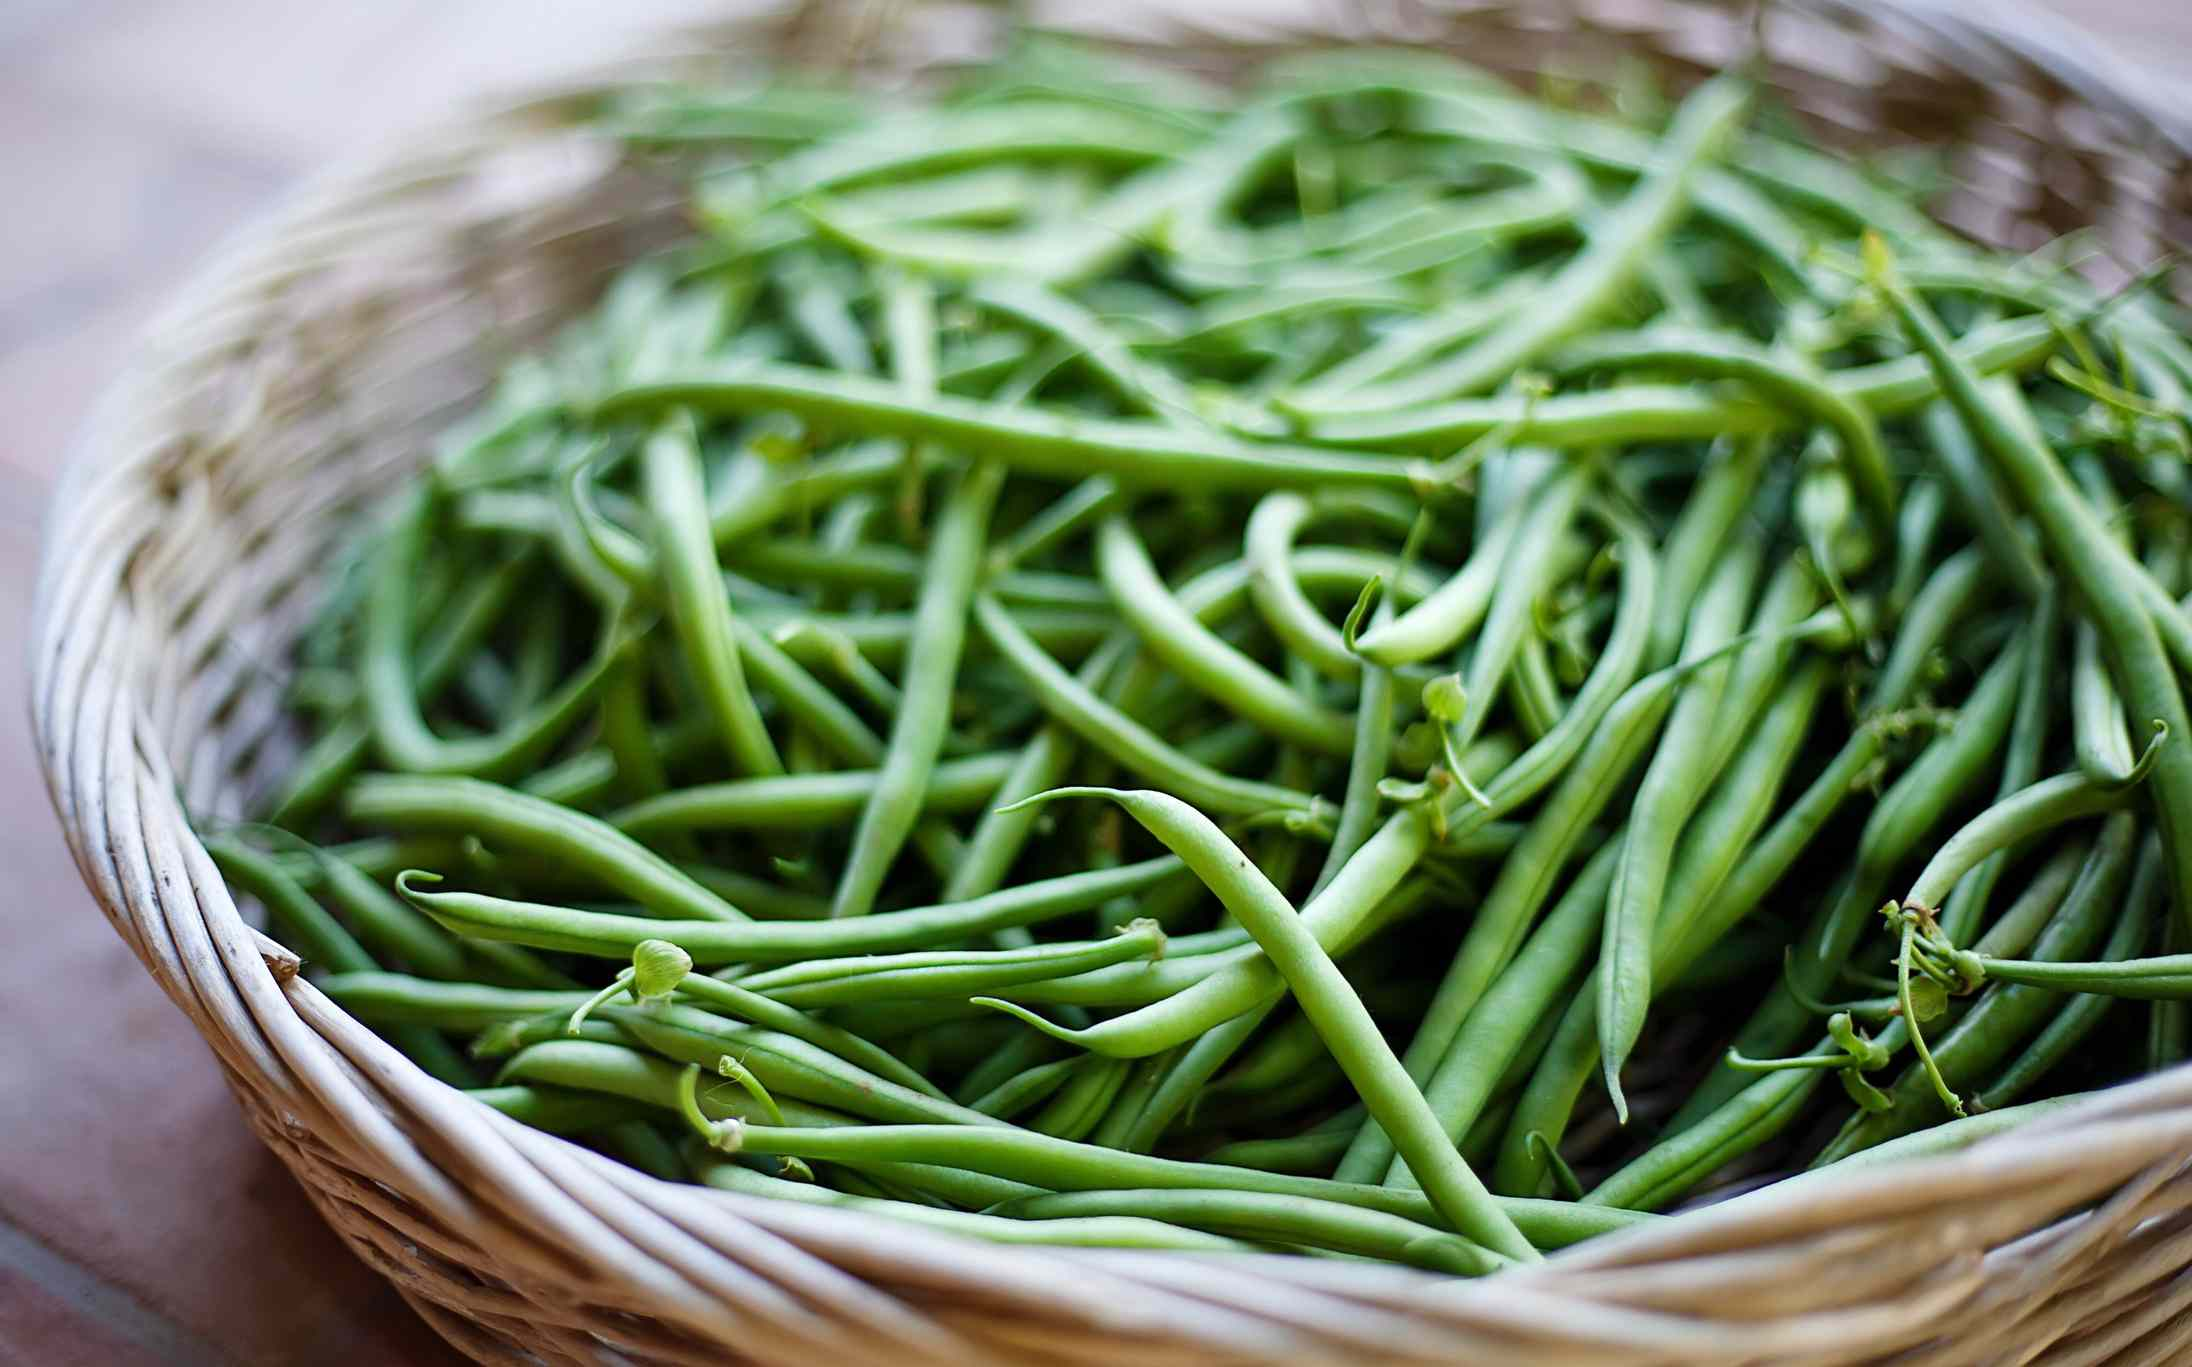 Woven basket full of green beans on table.